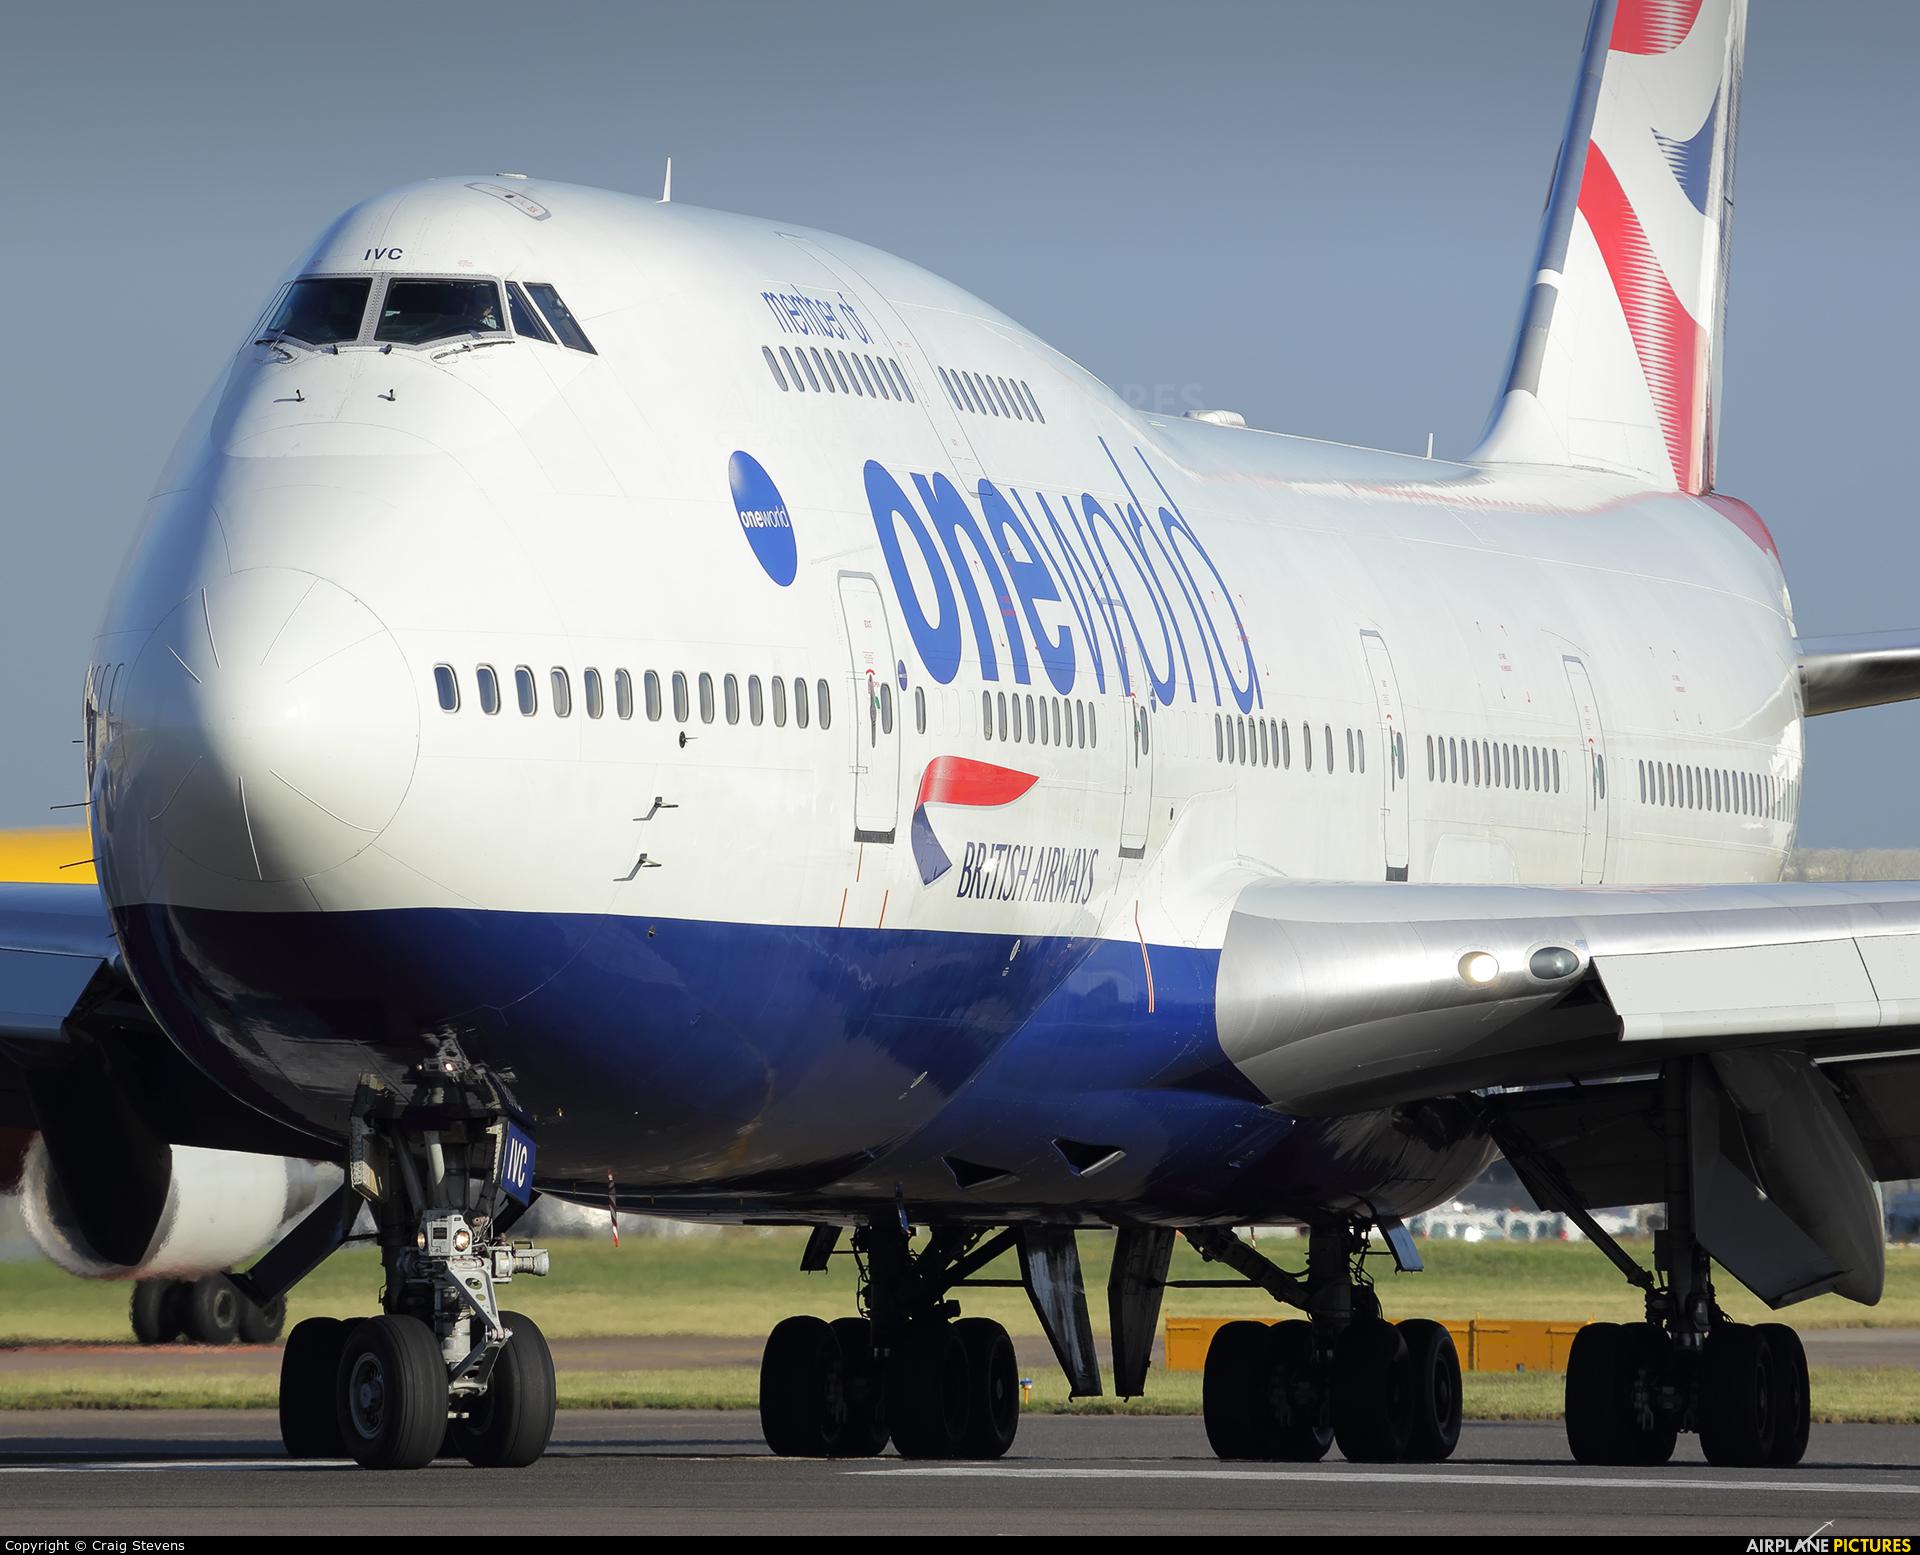 British Airways G-CIVC aircraft at London - Heathrow